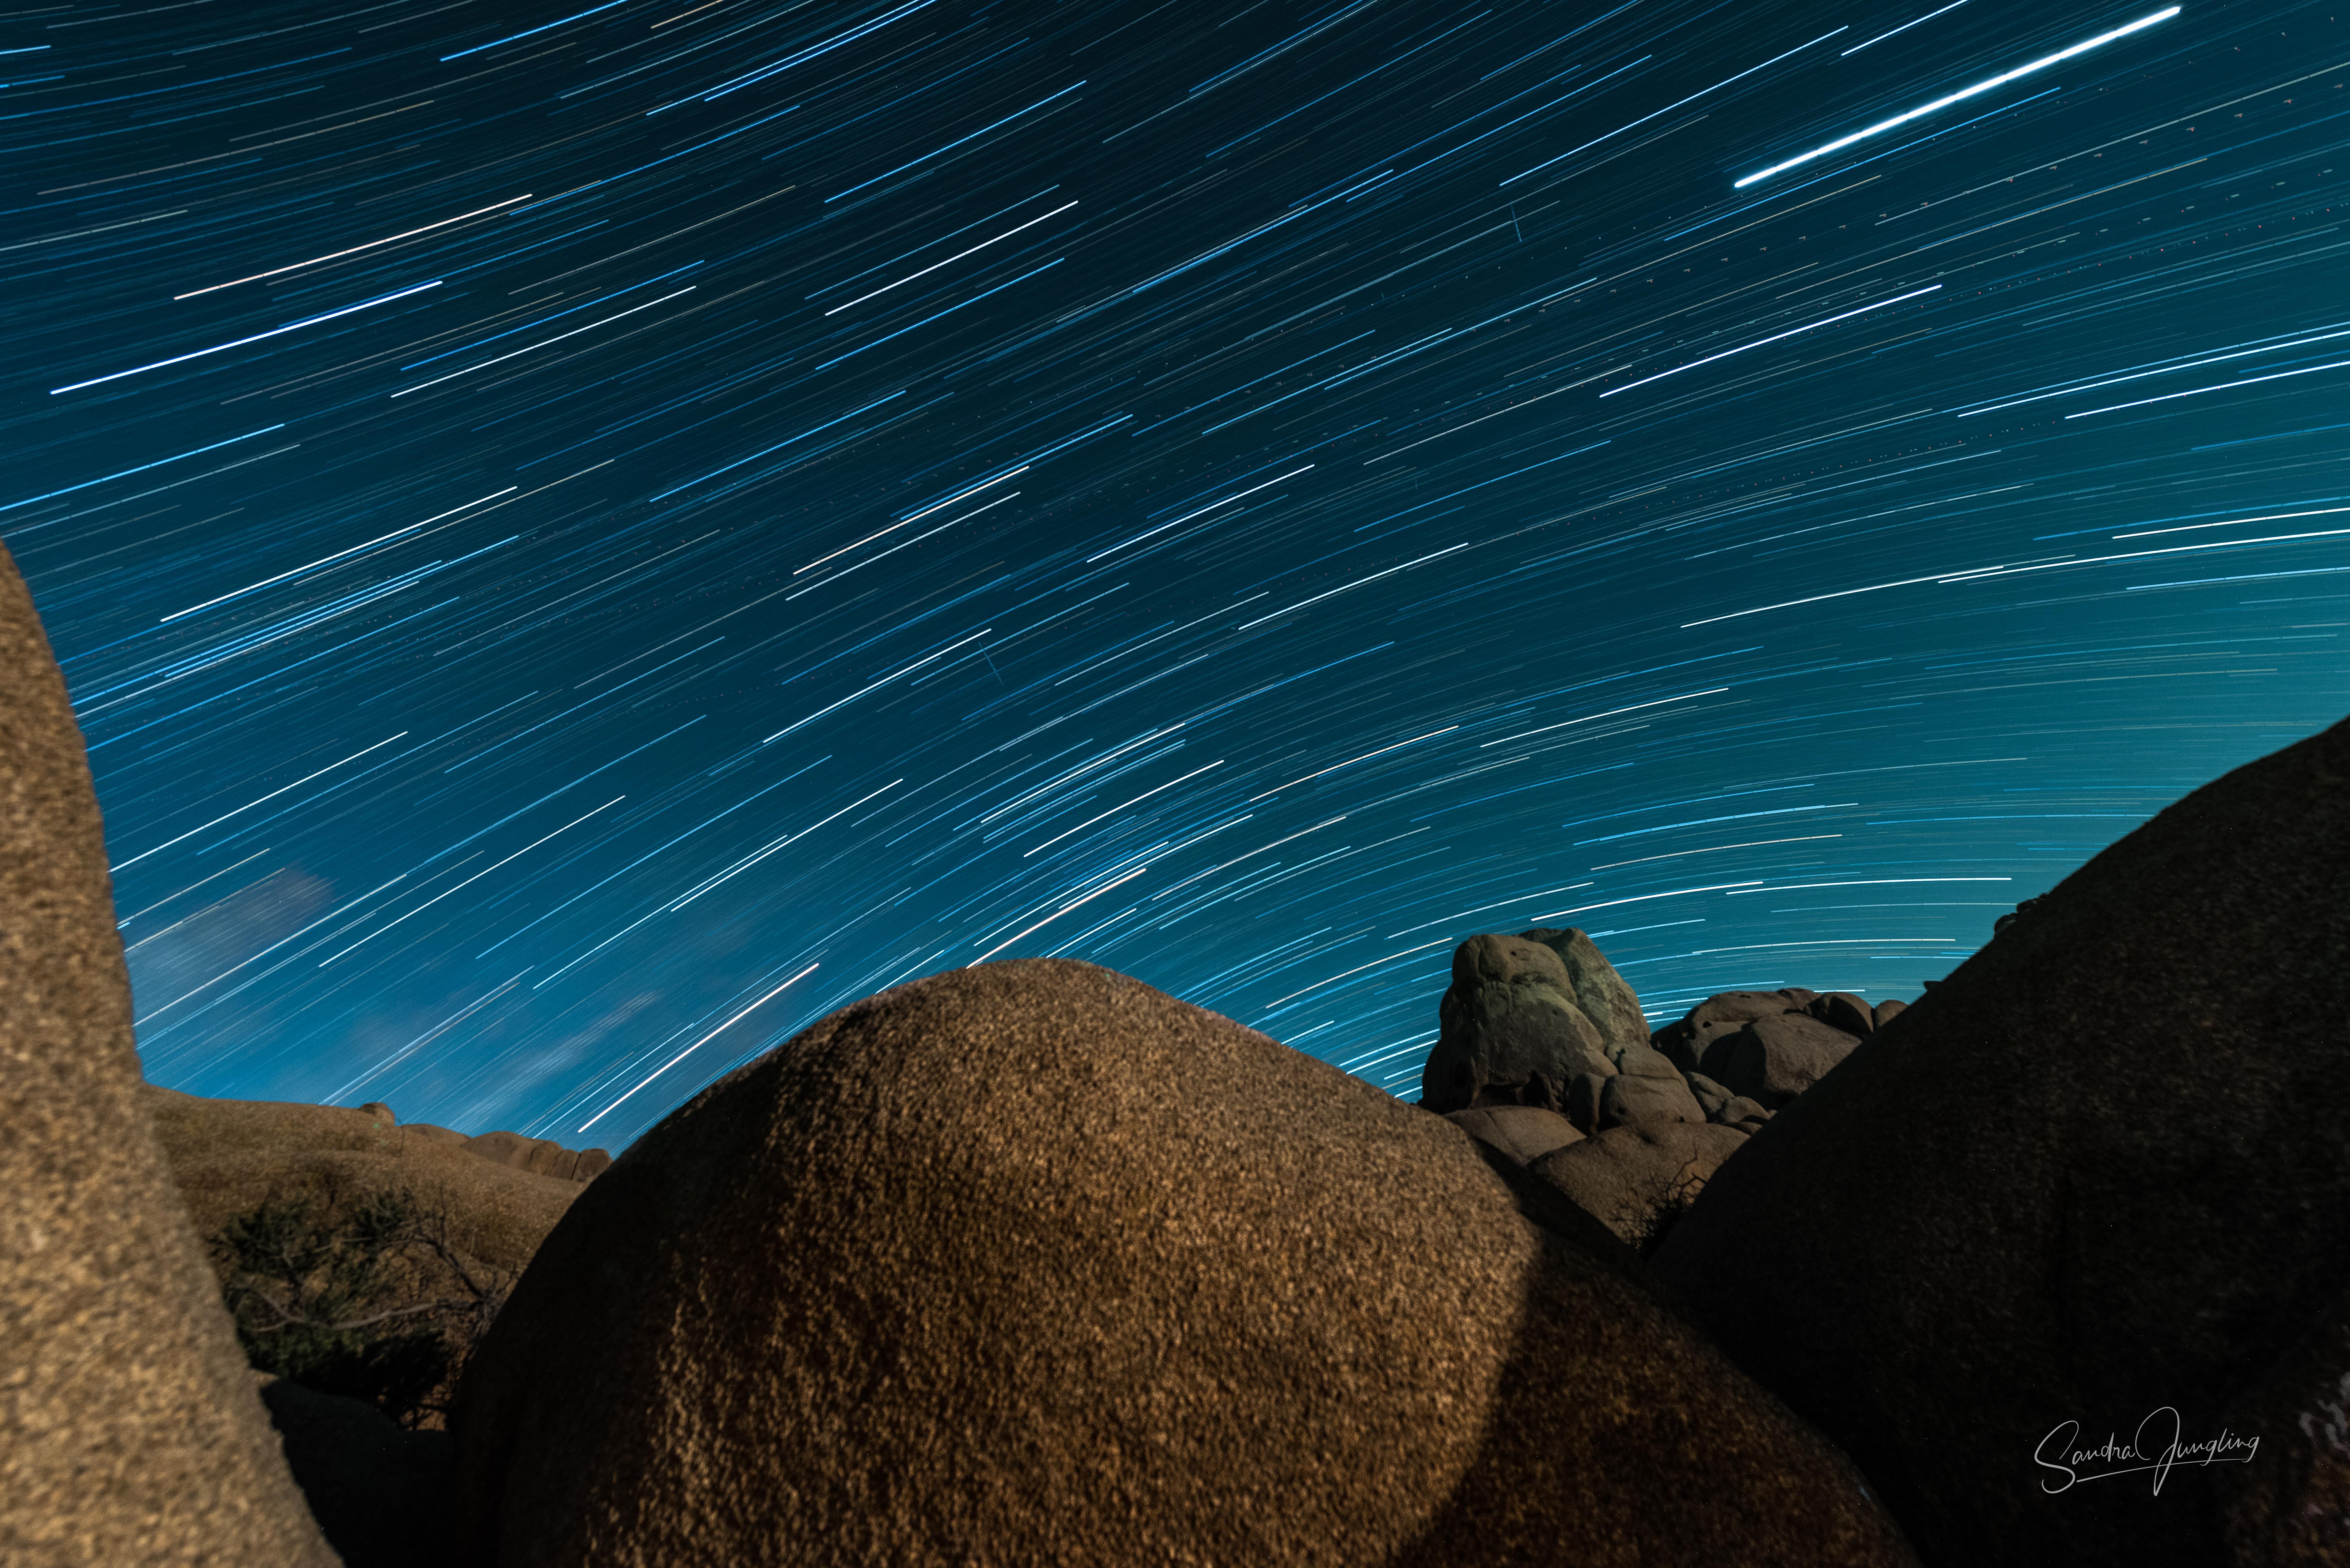 Rocks and star trails